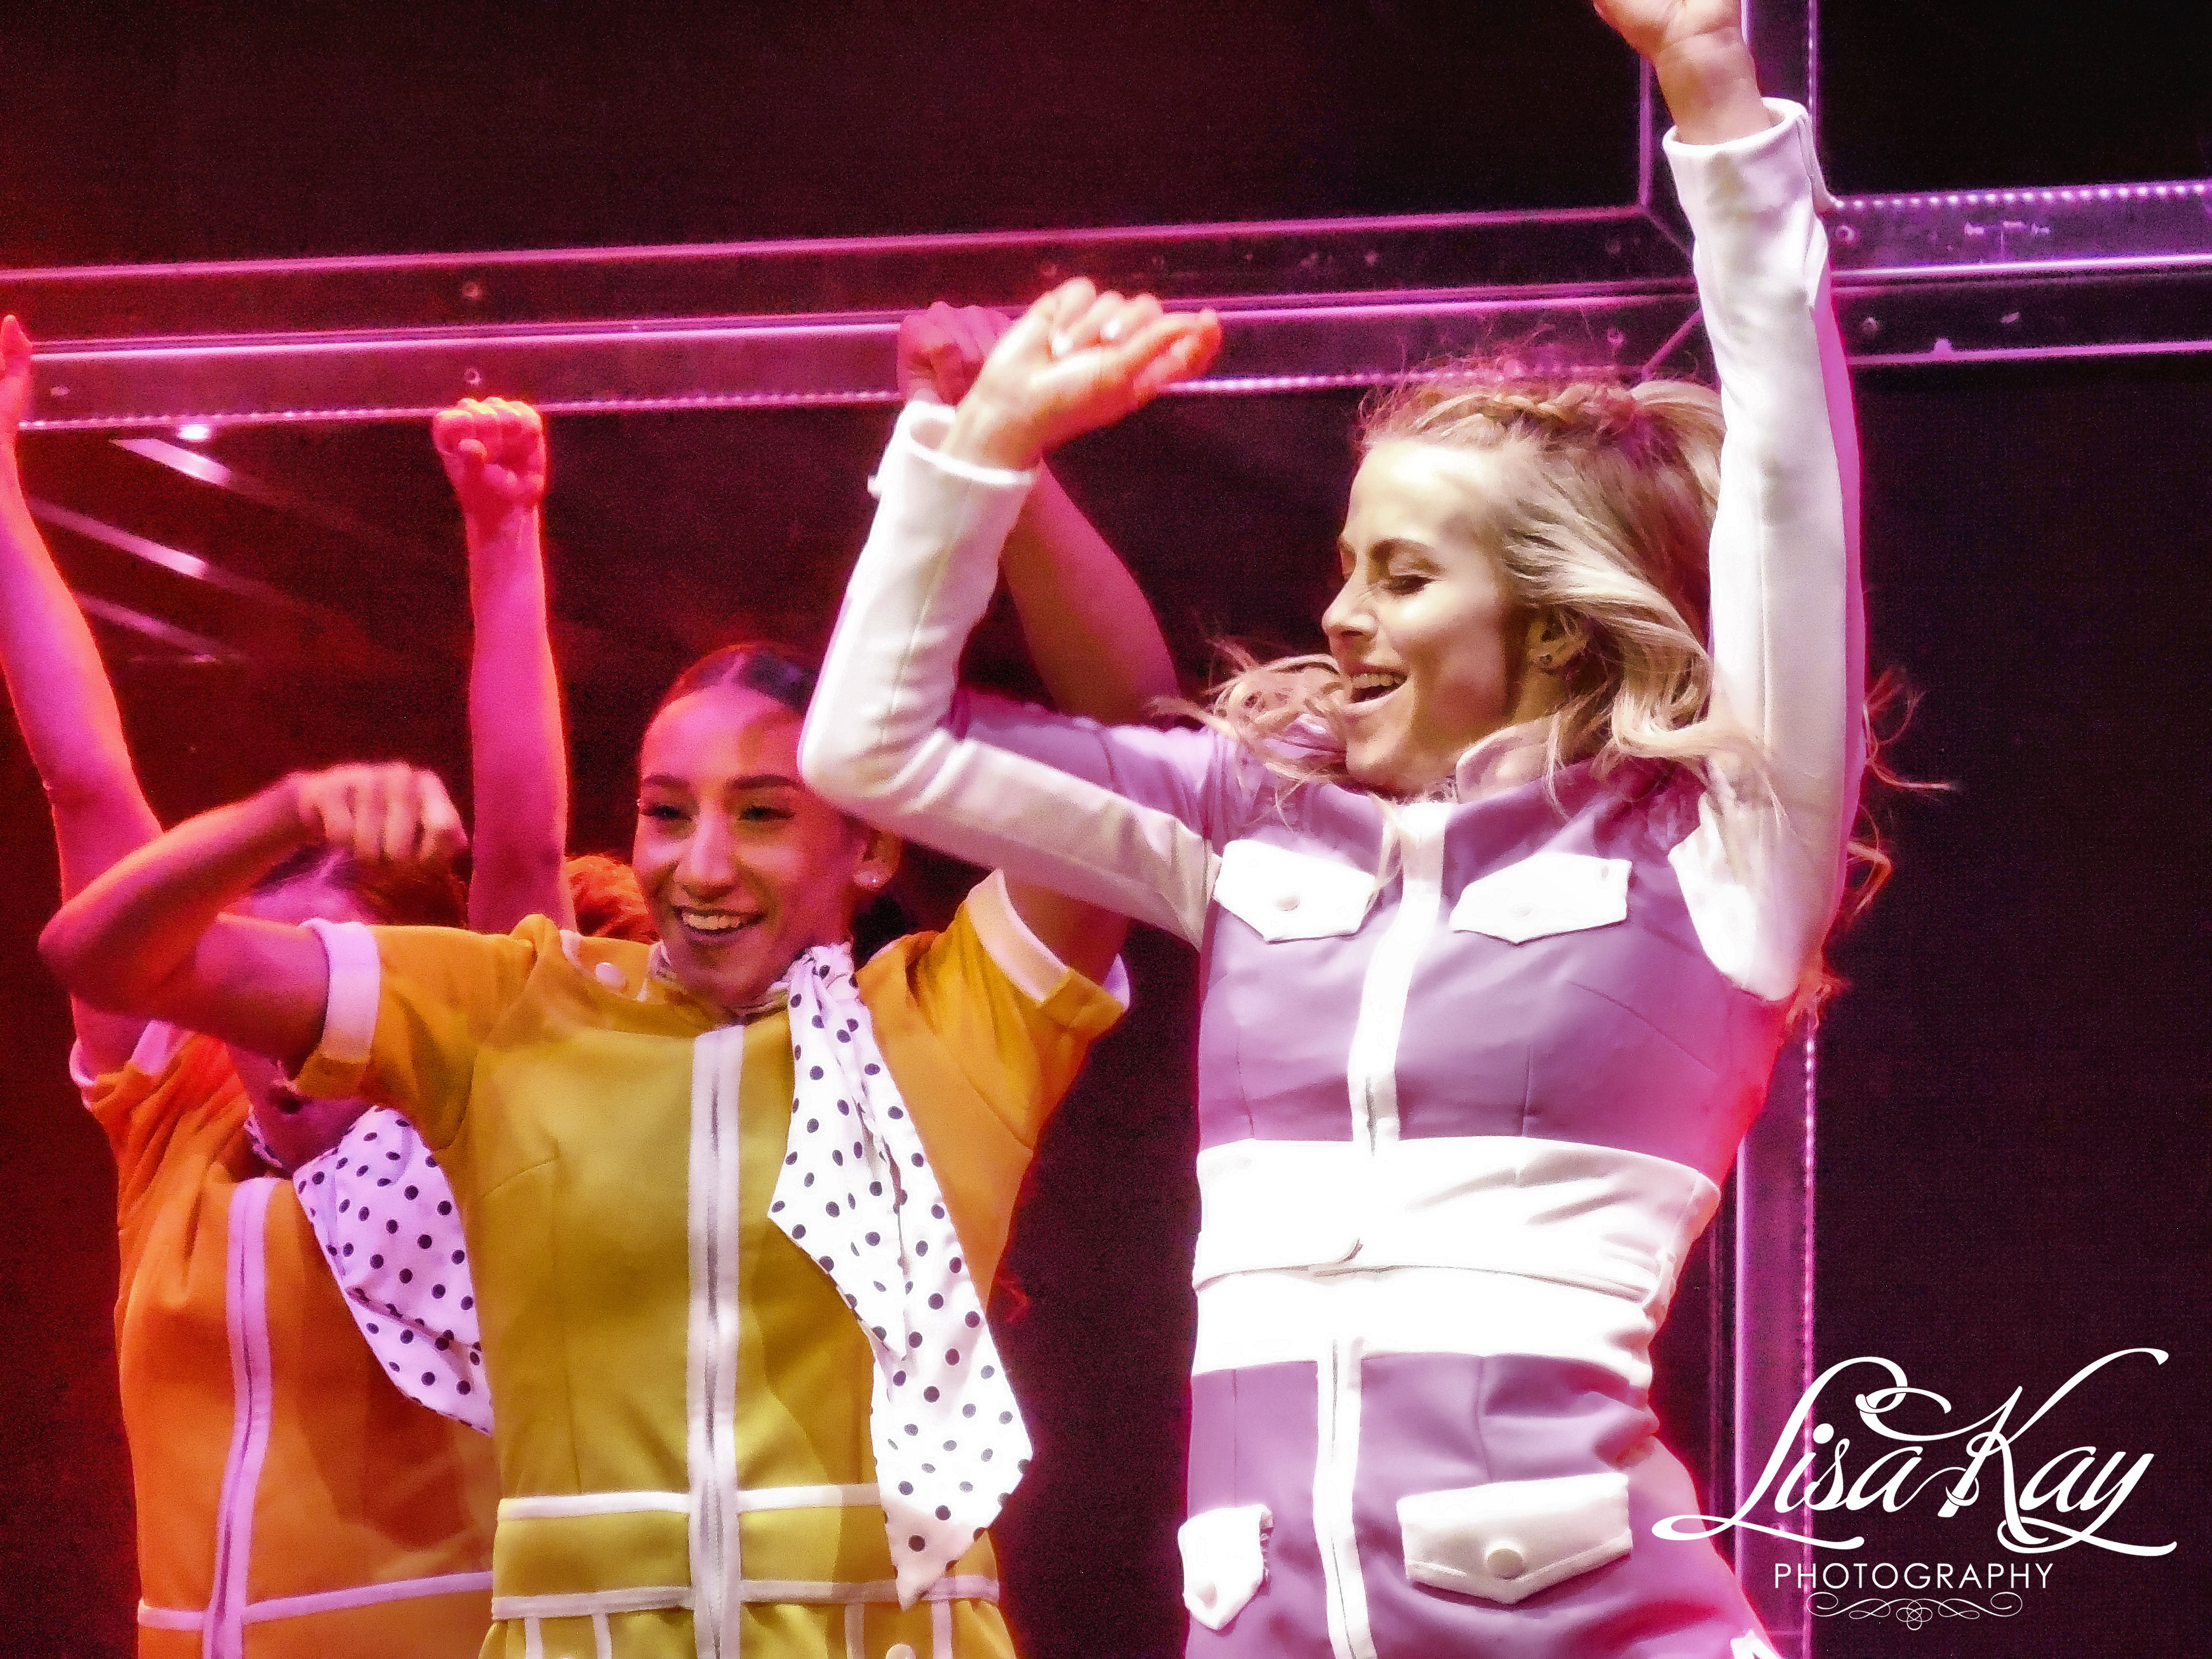 Derek And Julianne Hough Tour  Review